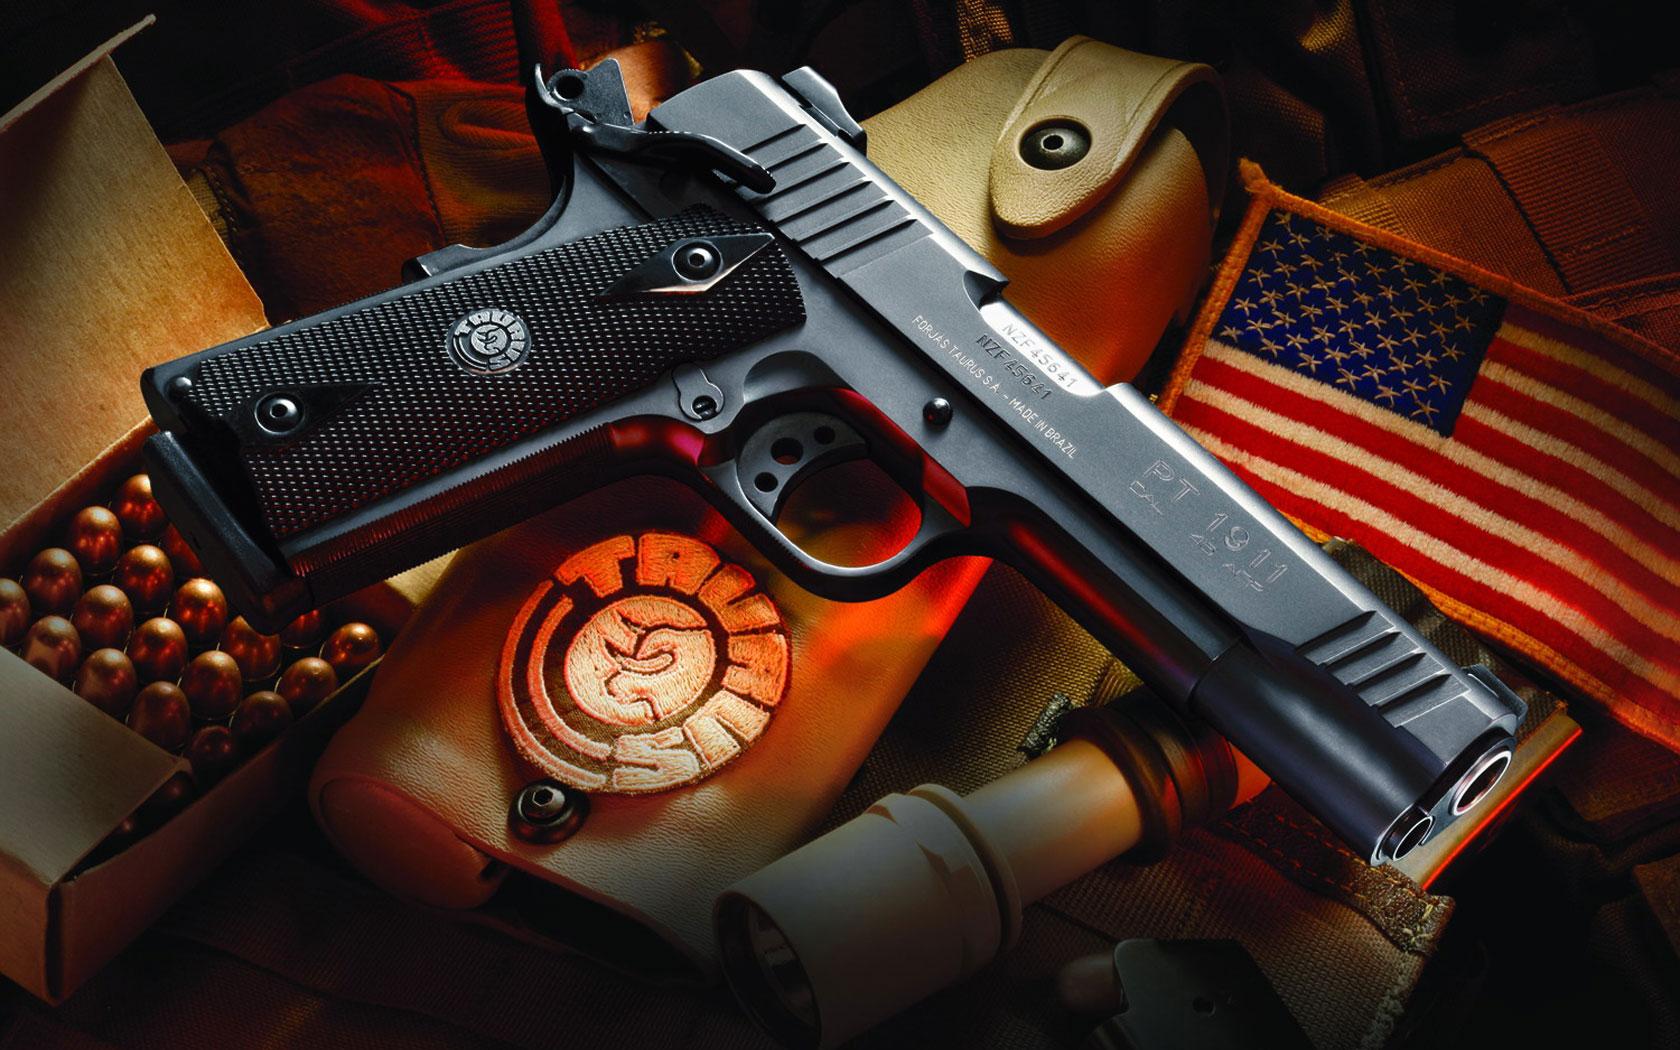 Taurus PT 1911 Guns Lot 1680x1050